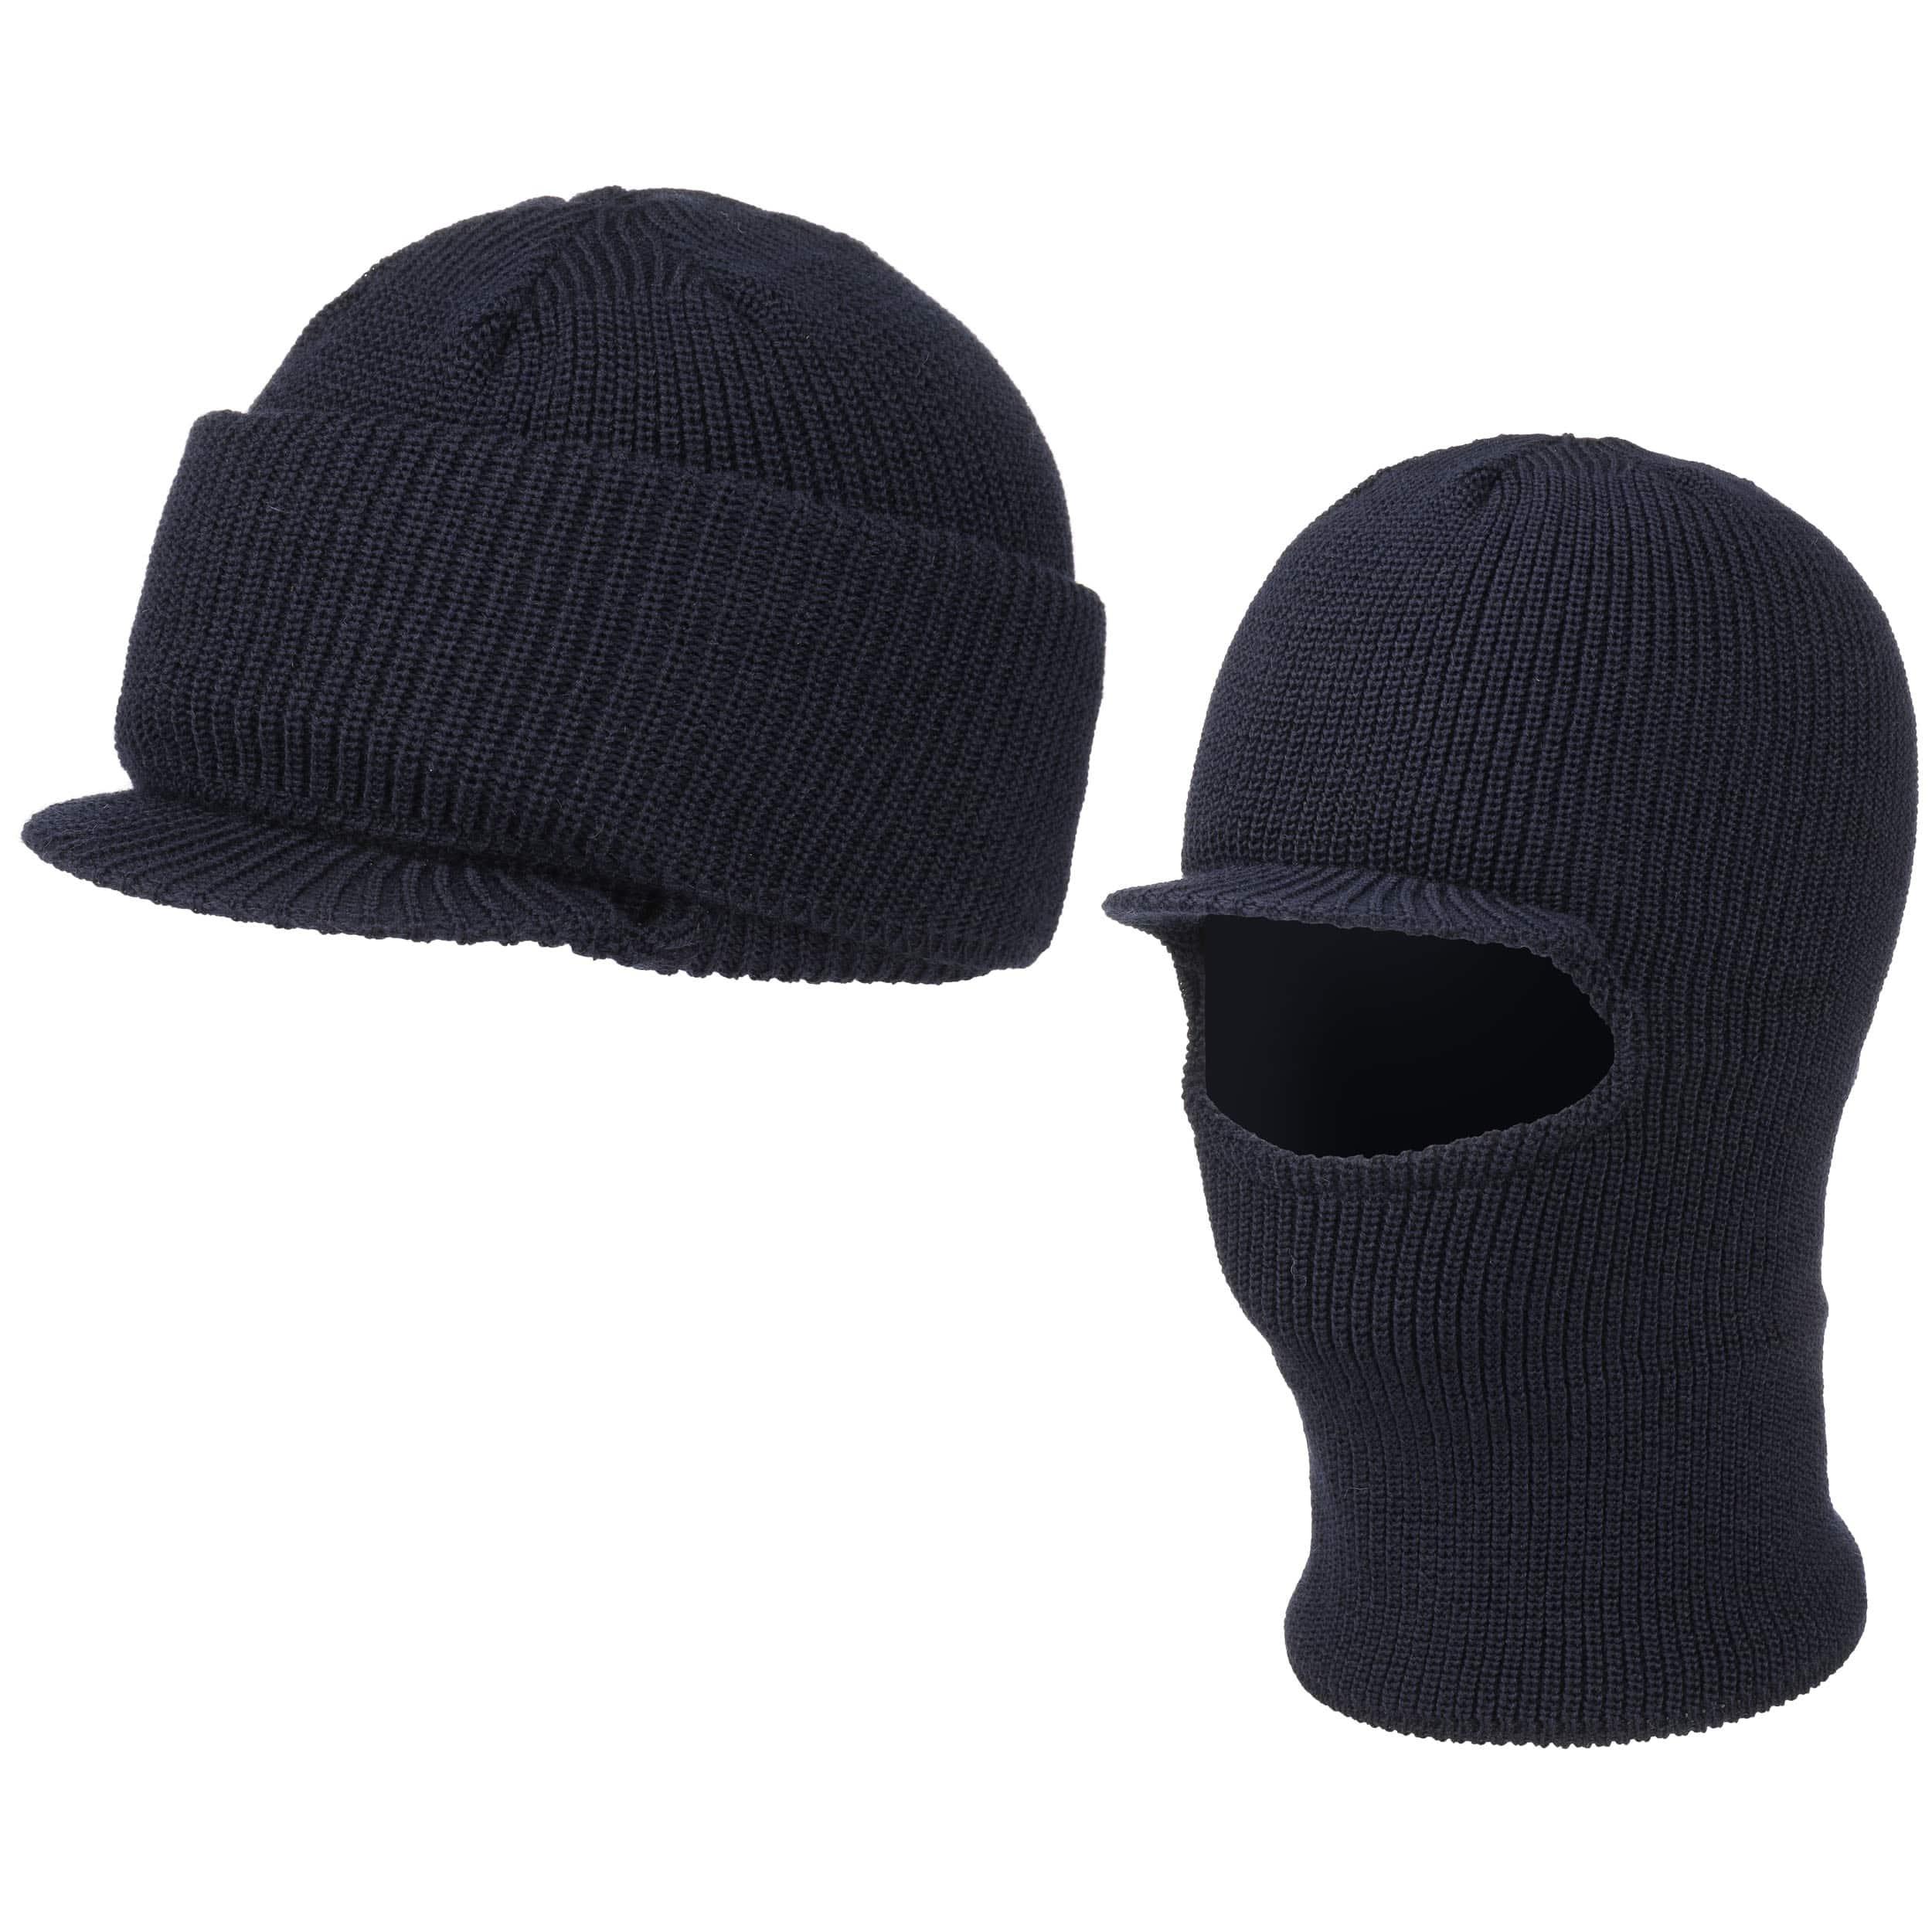 Gorro de Punto Steven Gentleman - Gorros - sombreroshop.es ebd541b2776